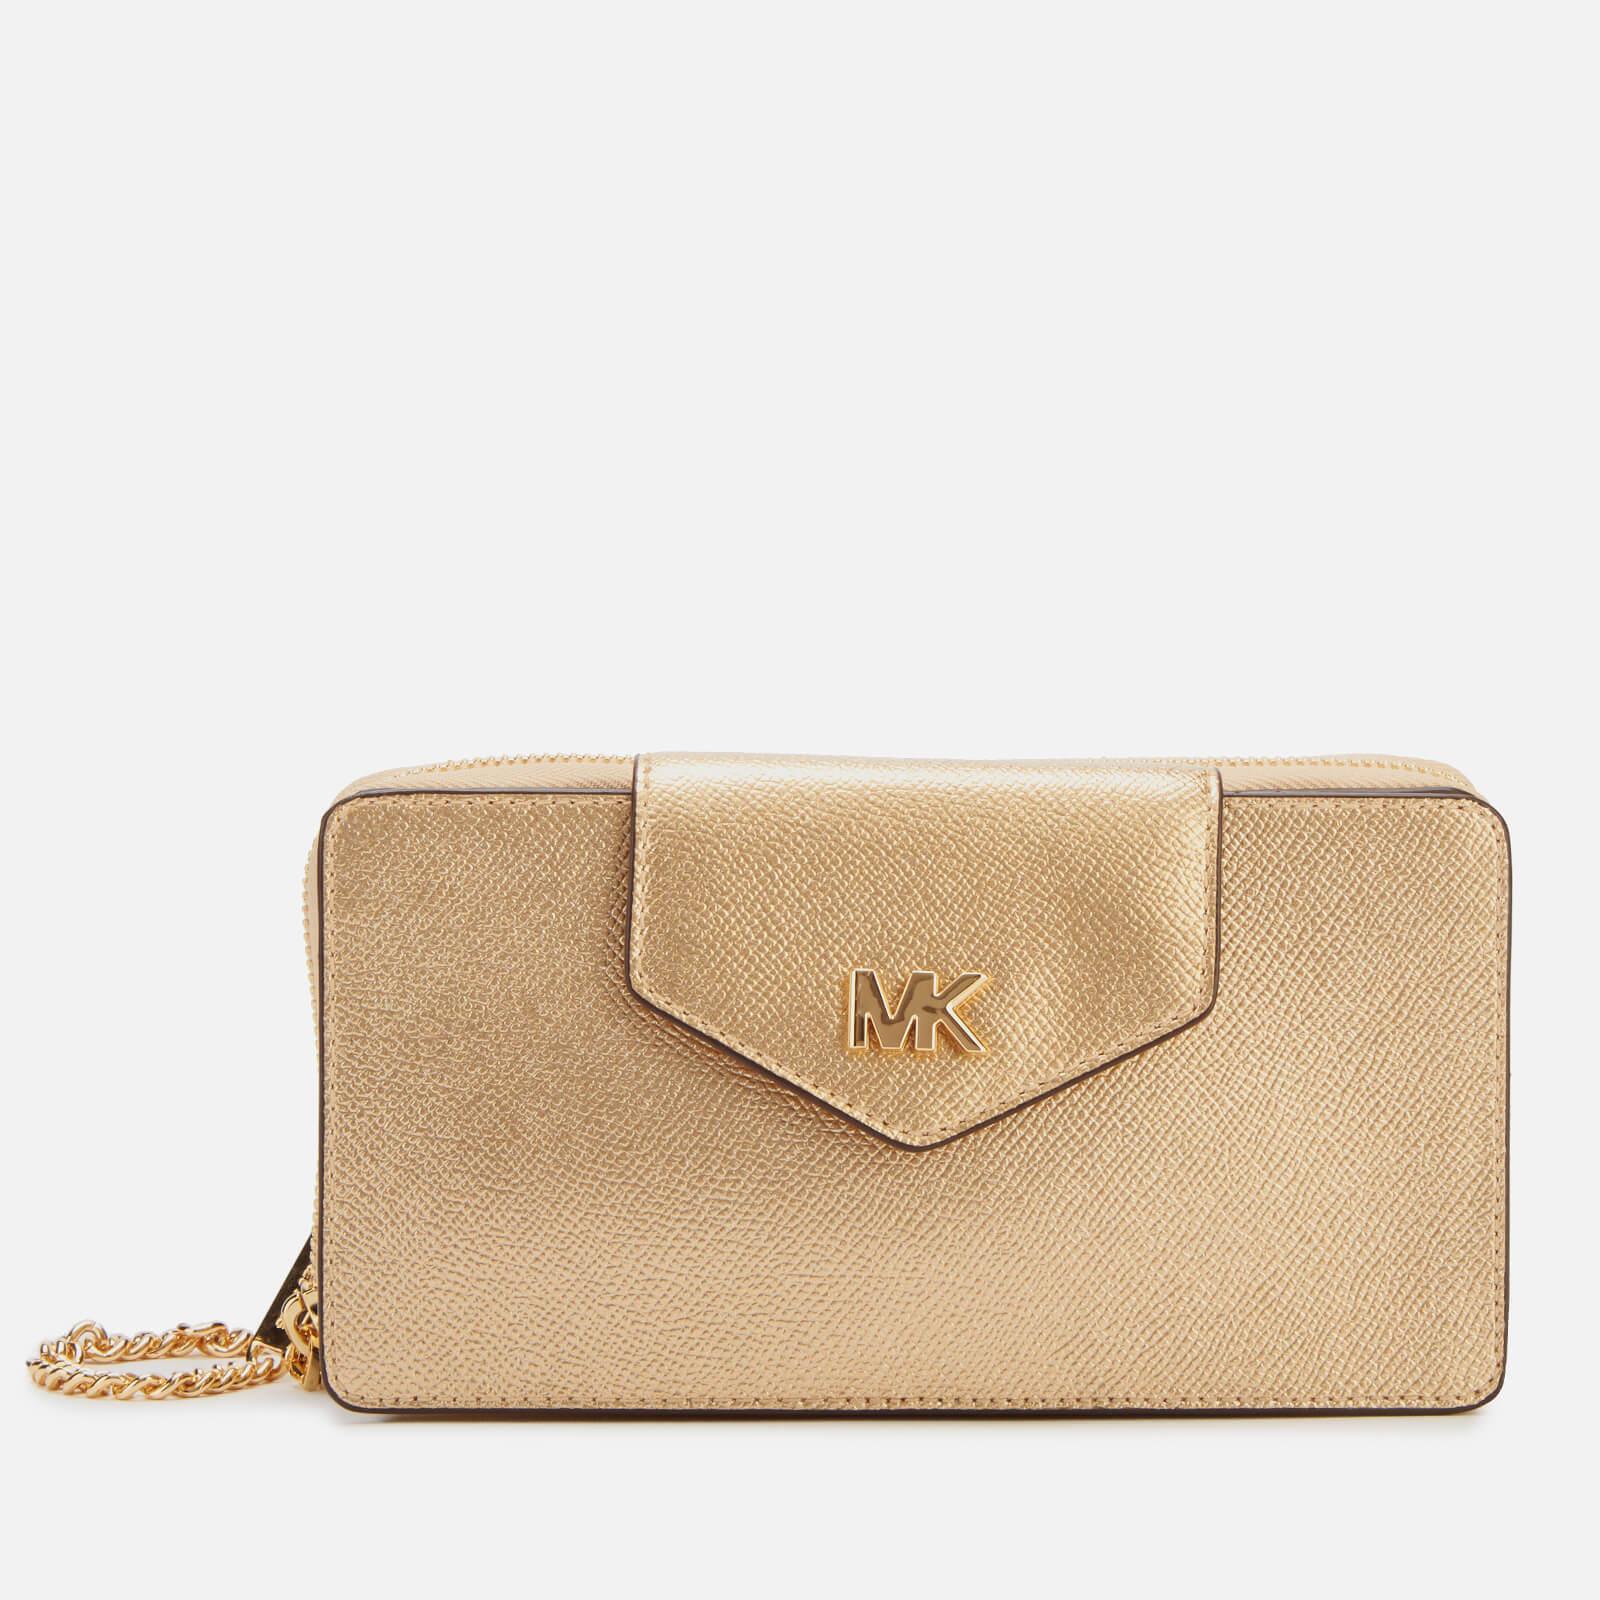 MICHAEL MICHAEL KORS Women's Small Convertible Phone Cross Body Bag - Pale Gold